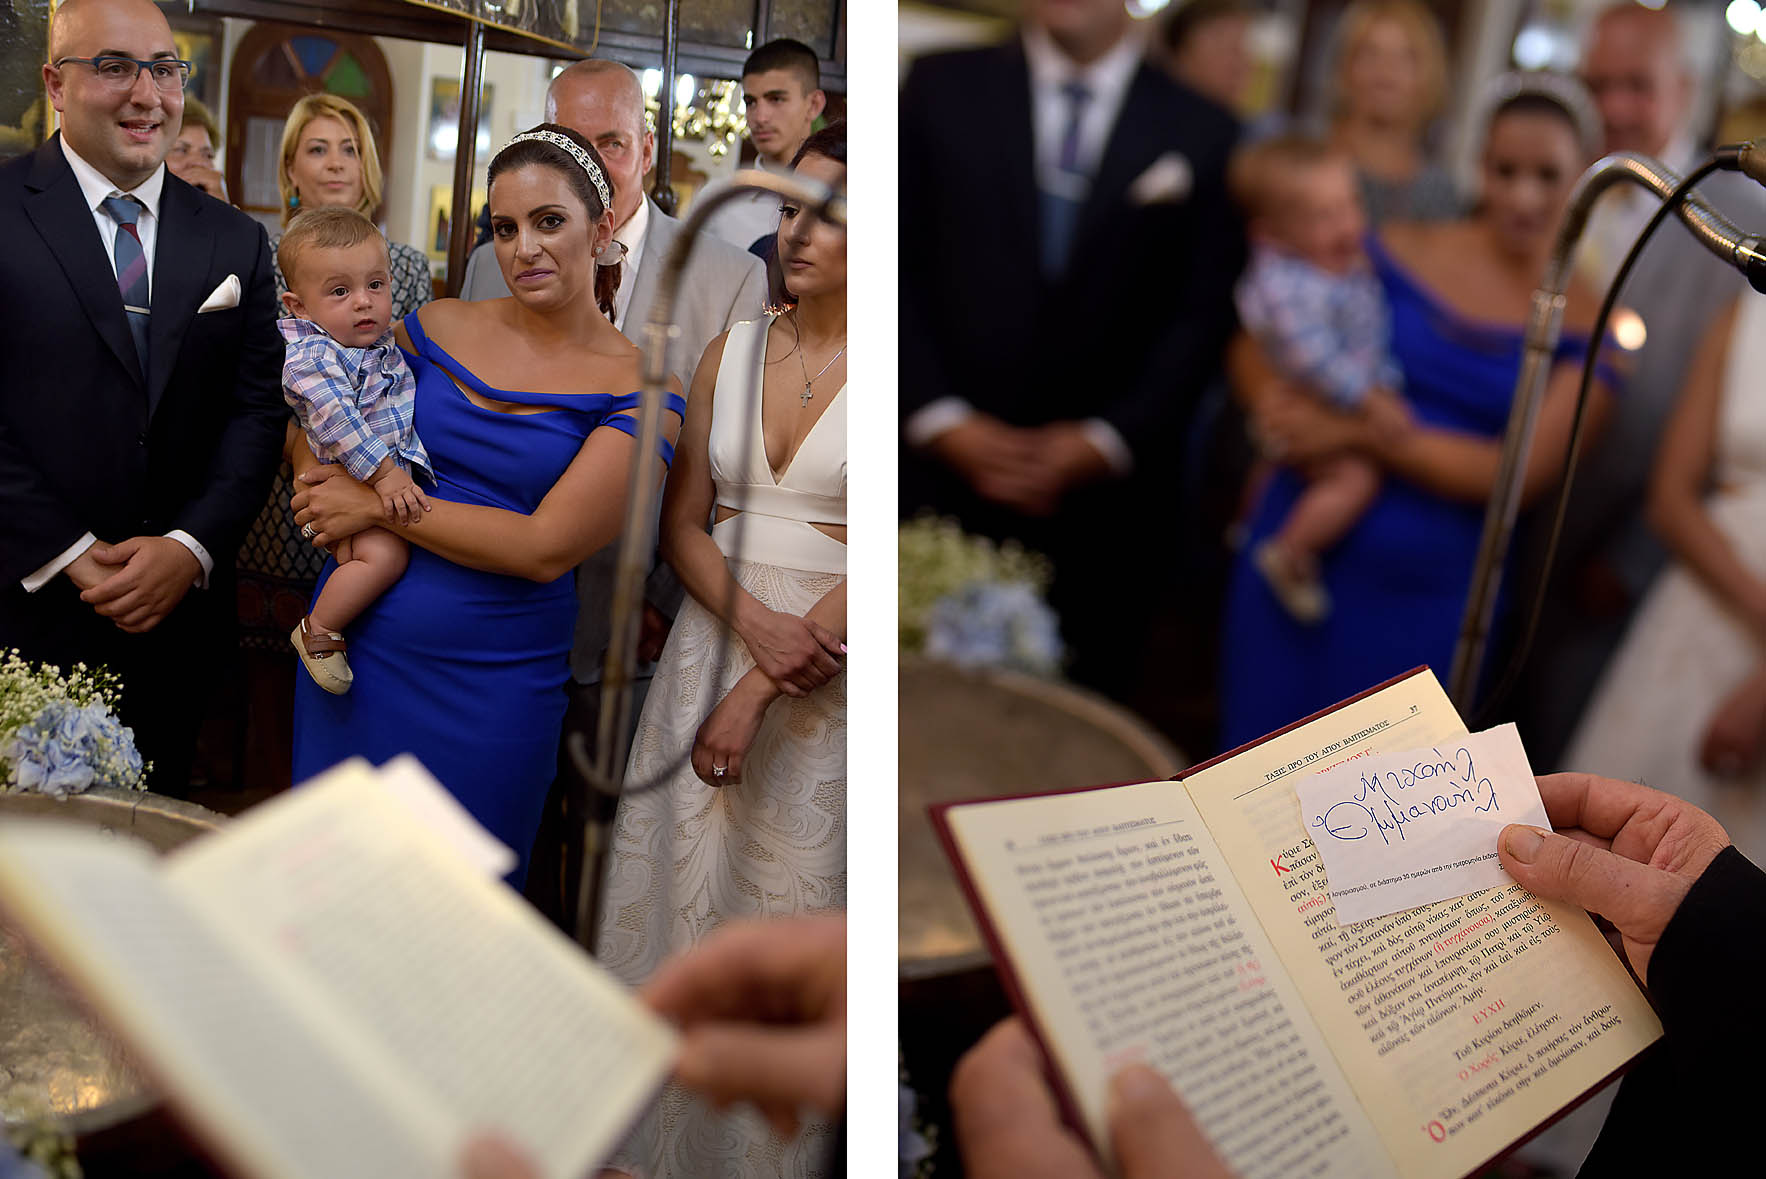 panagia-siriotissa-kampos-chios-christening-baptism-alexis-koumaditis-photography-04